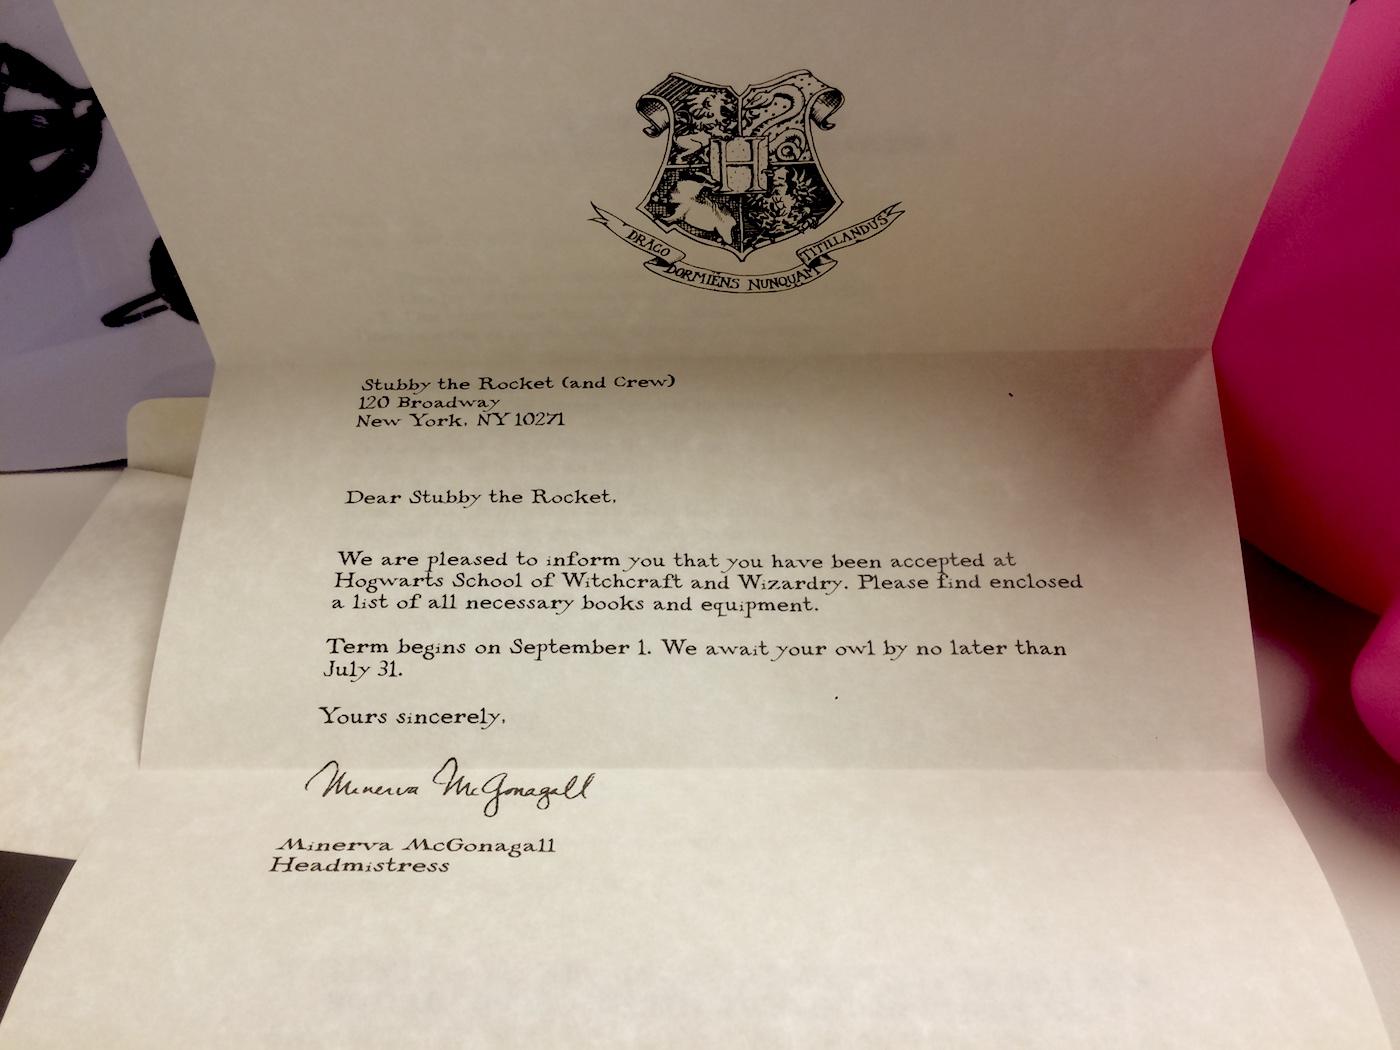 Stubby the Rocket Hogwarts letter Tor.com 11th birthday